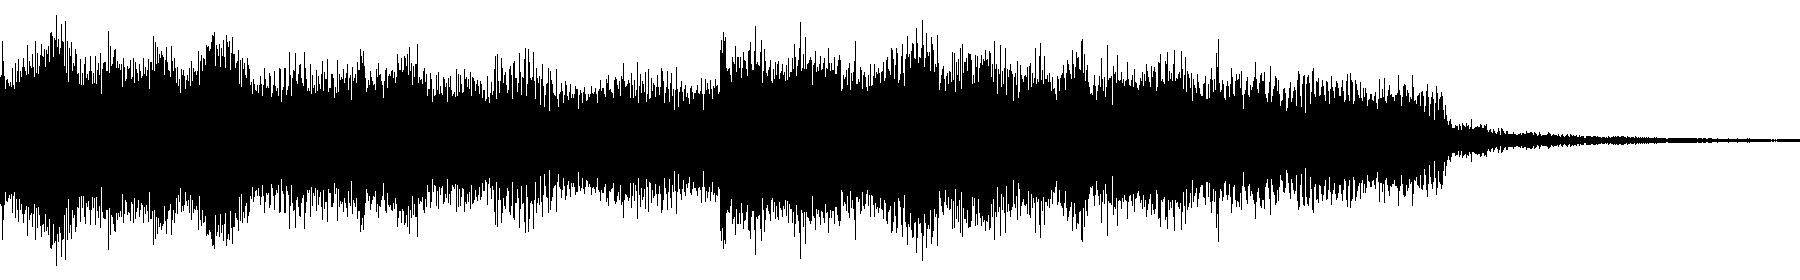 vedh melodyloop 008 gm dm cm 124bpm